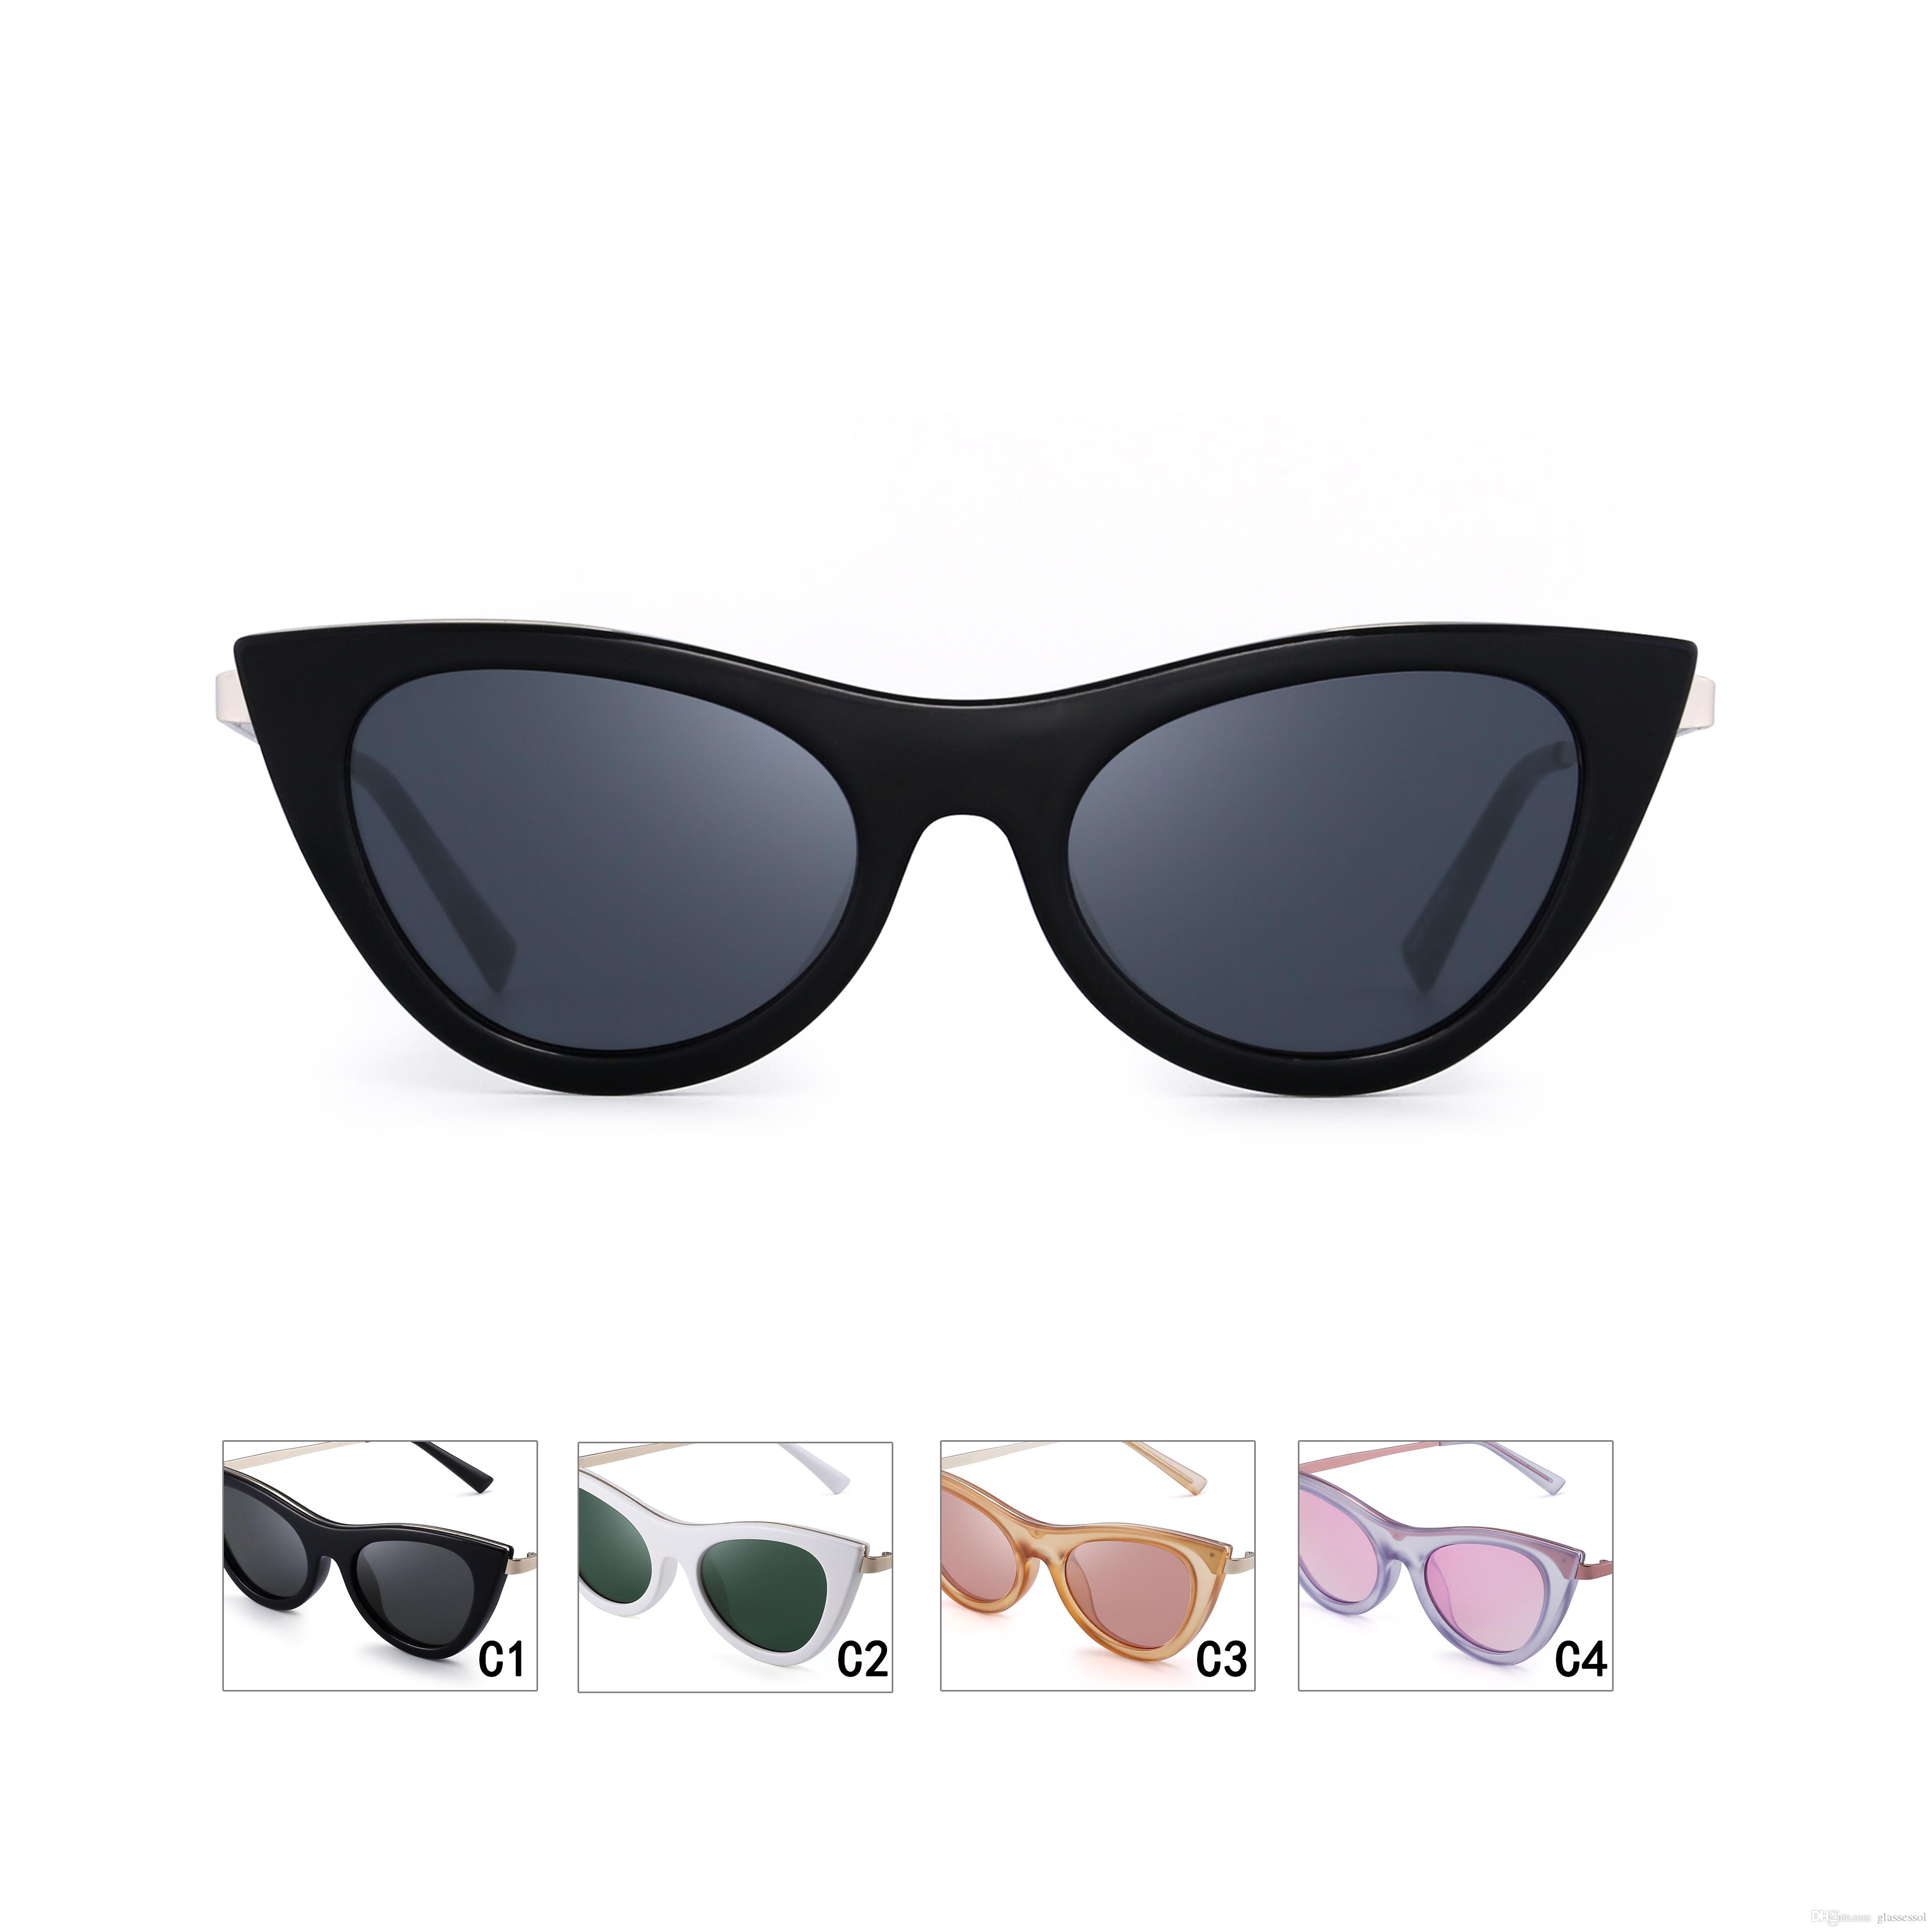 bb9163a259aeb Fashionable Sunglasses Women Sunglasses Cat Eye Shades Luxury Designer Sun  Glasses Polarised Sunglasses Baby Sunglasses From Glassessol